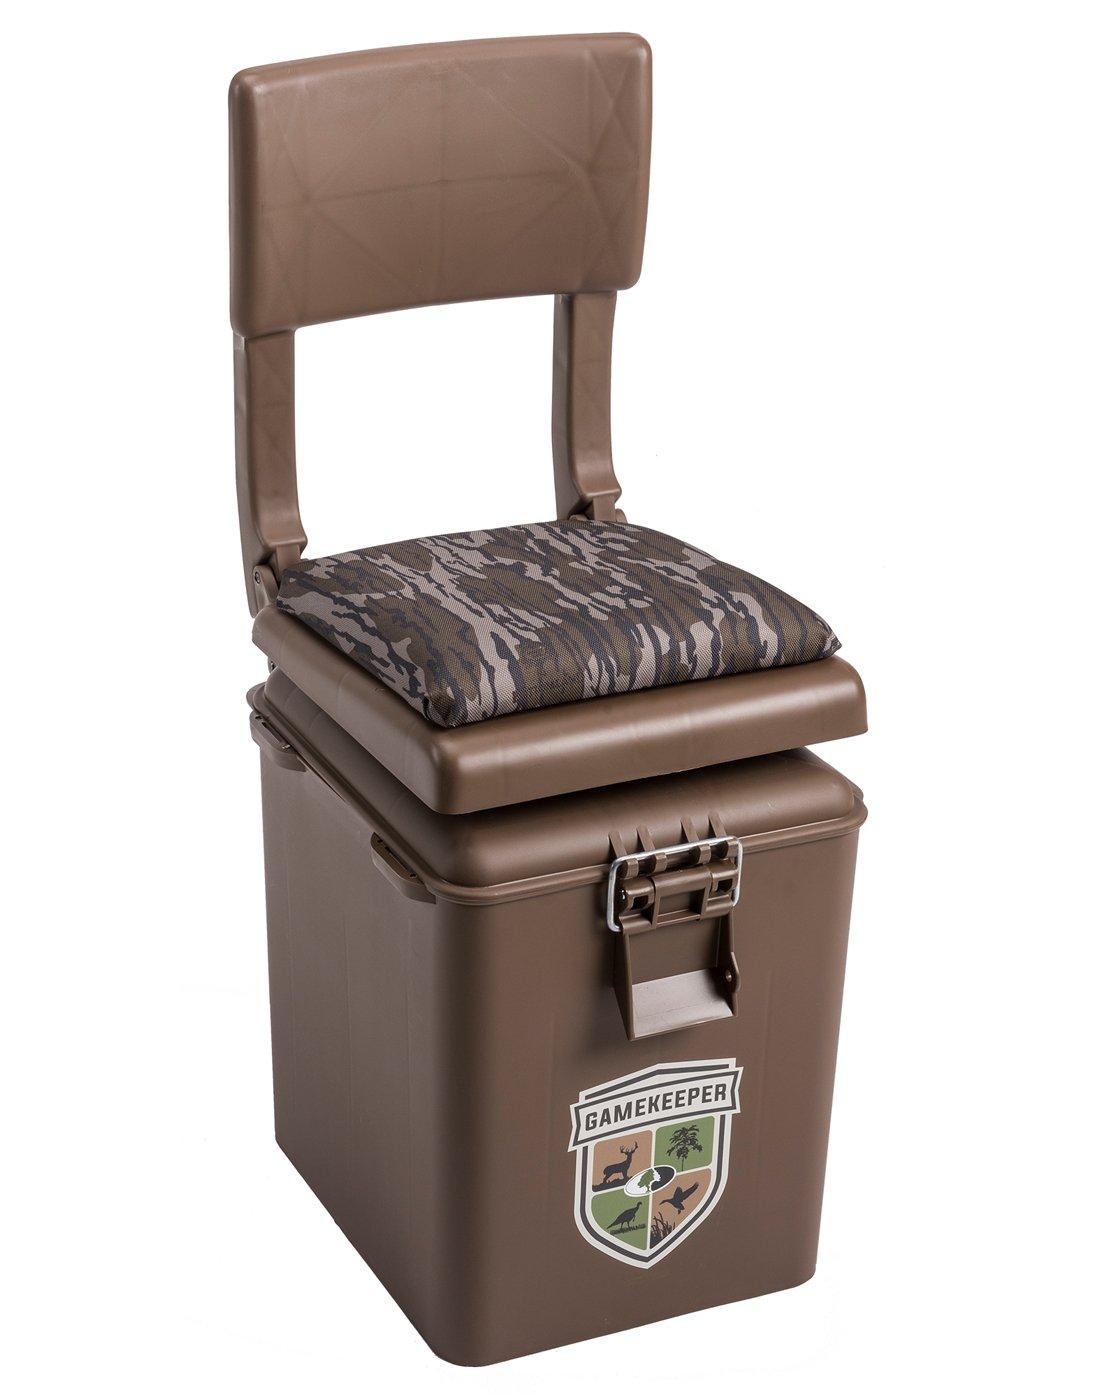 Wise Outdoors 5613-GK Sport Seat: Gamekeeper Edition Super Sport Seat: Gamekeeper Edition